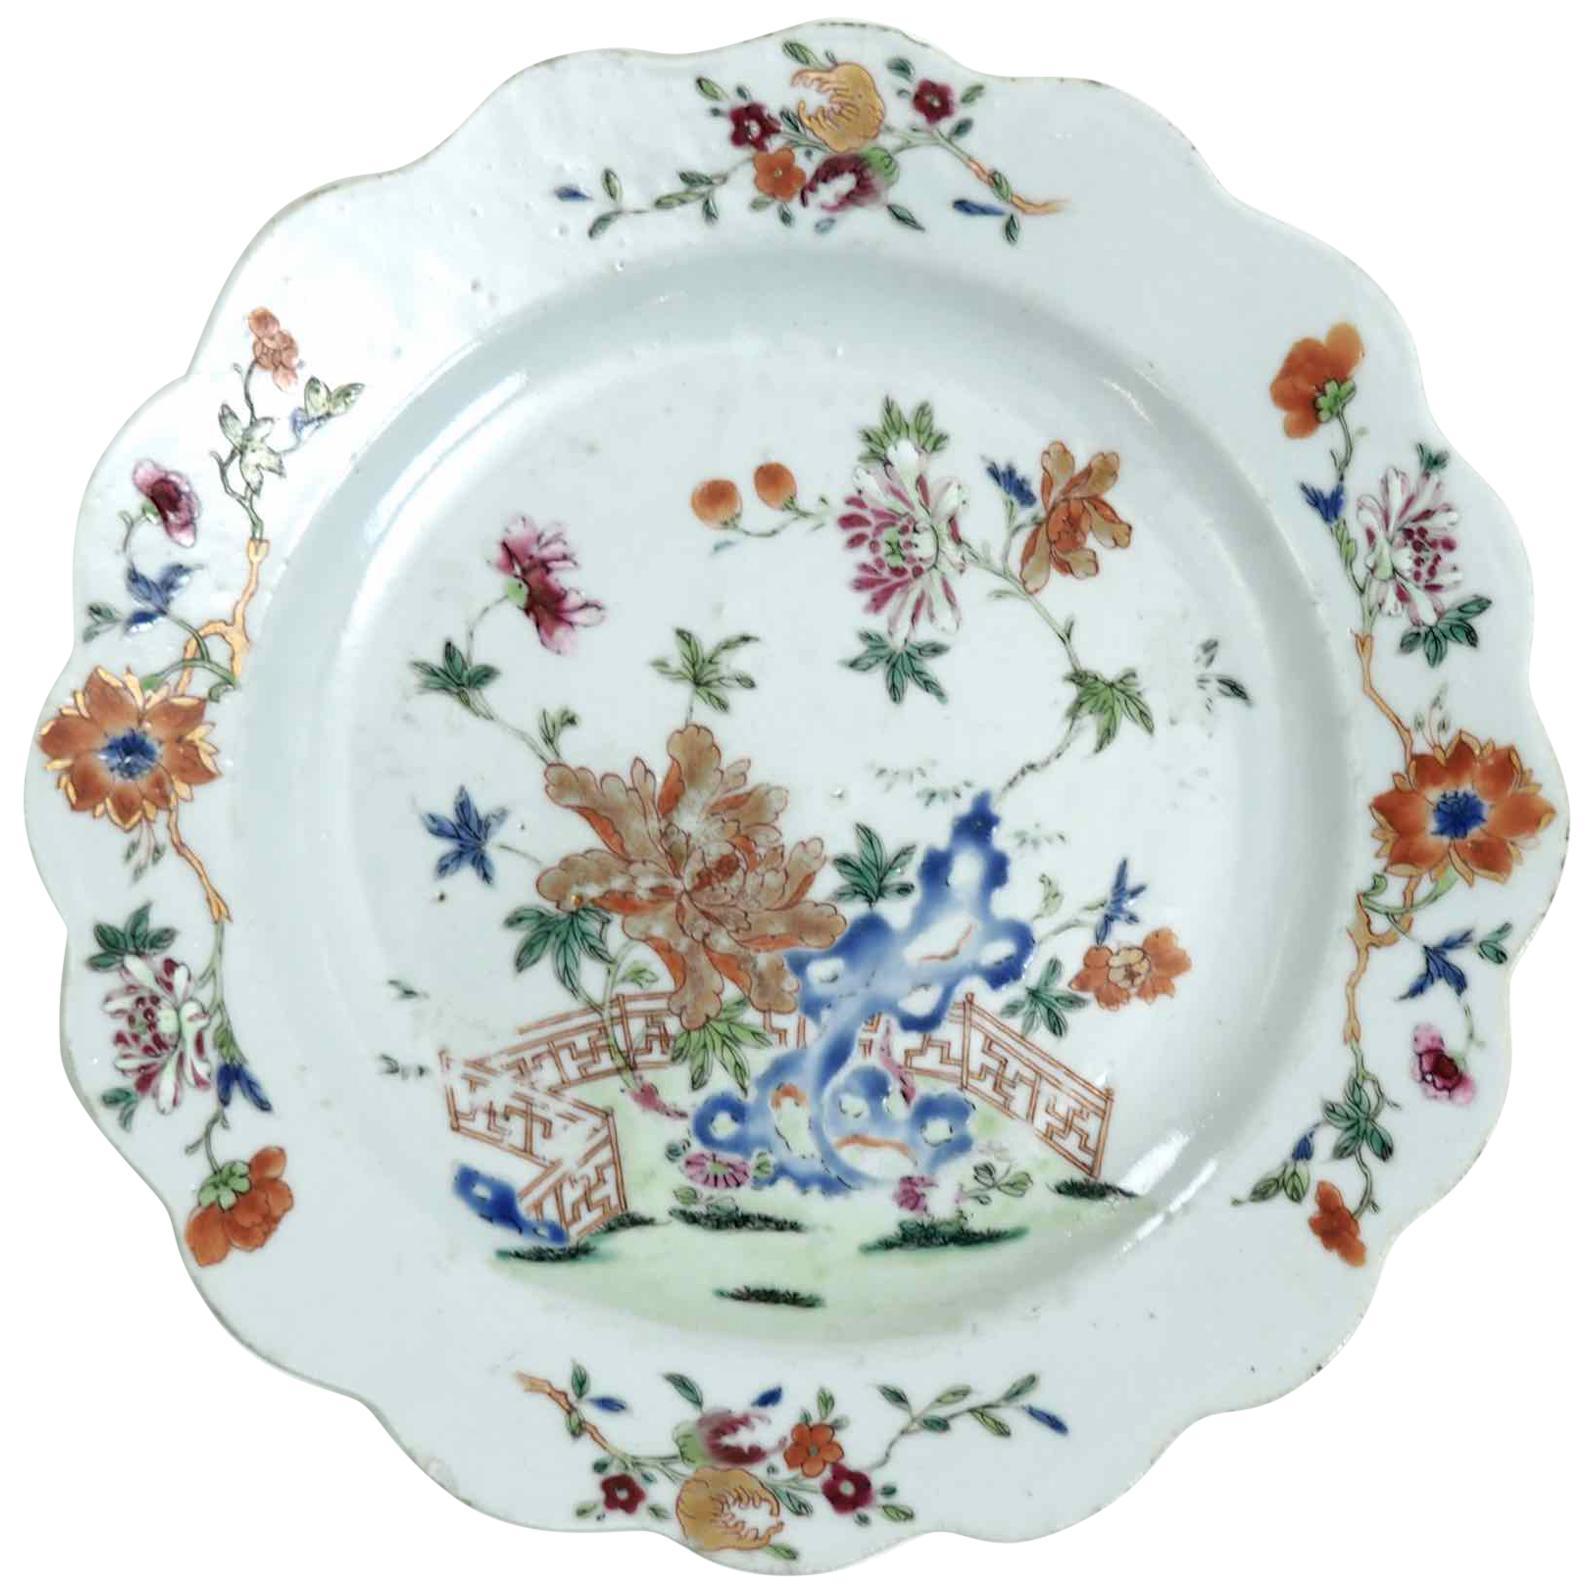 Chinese Plate, 18th Century